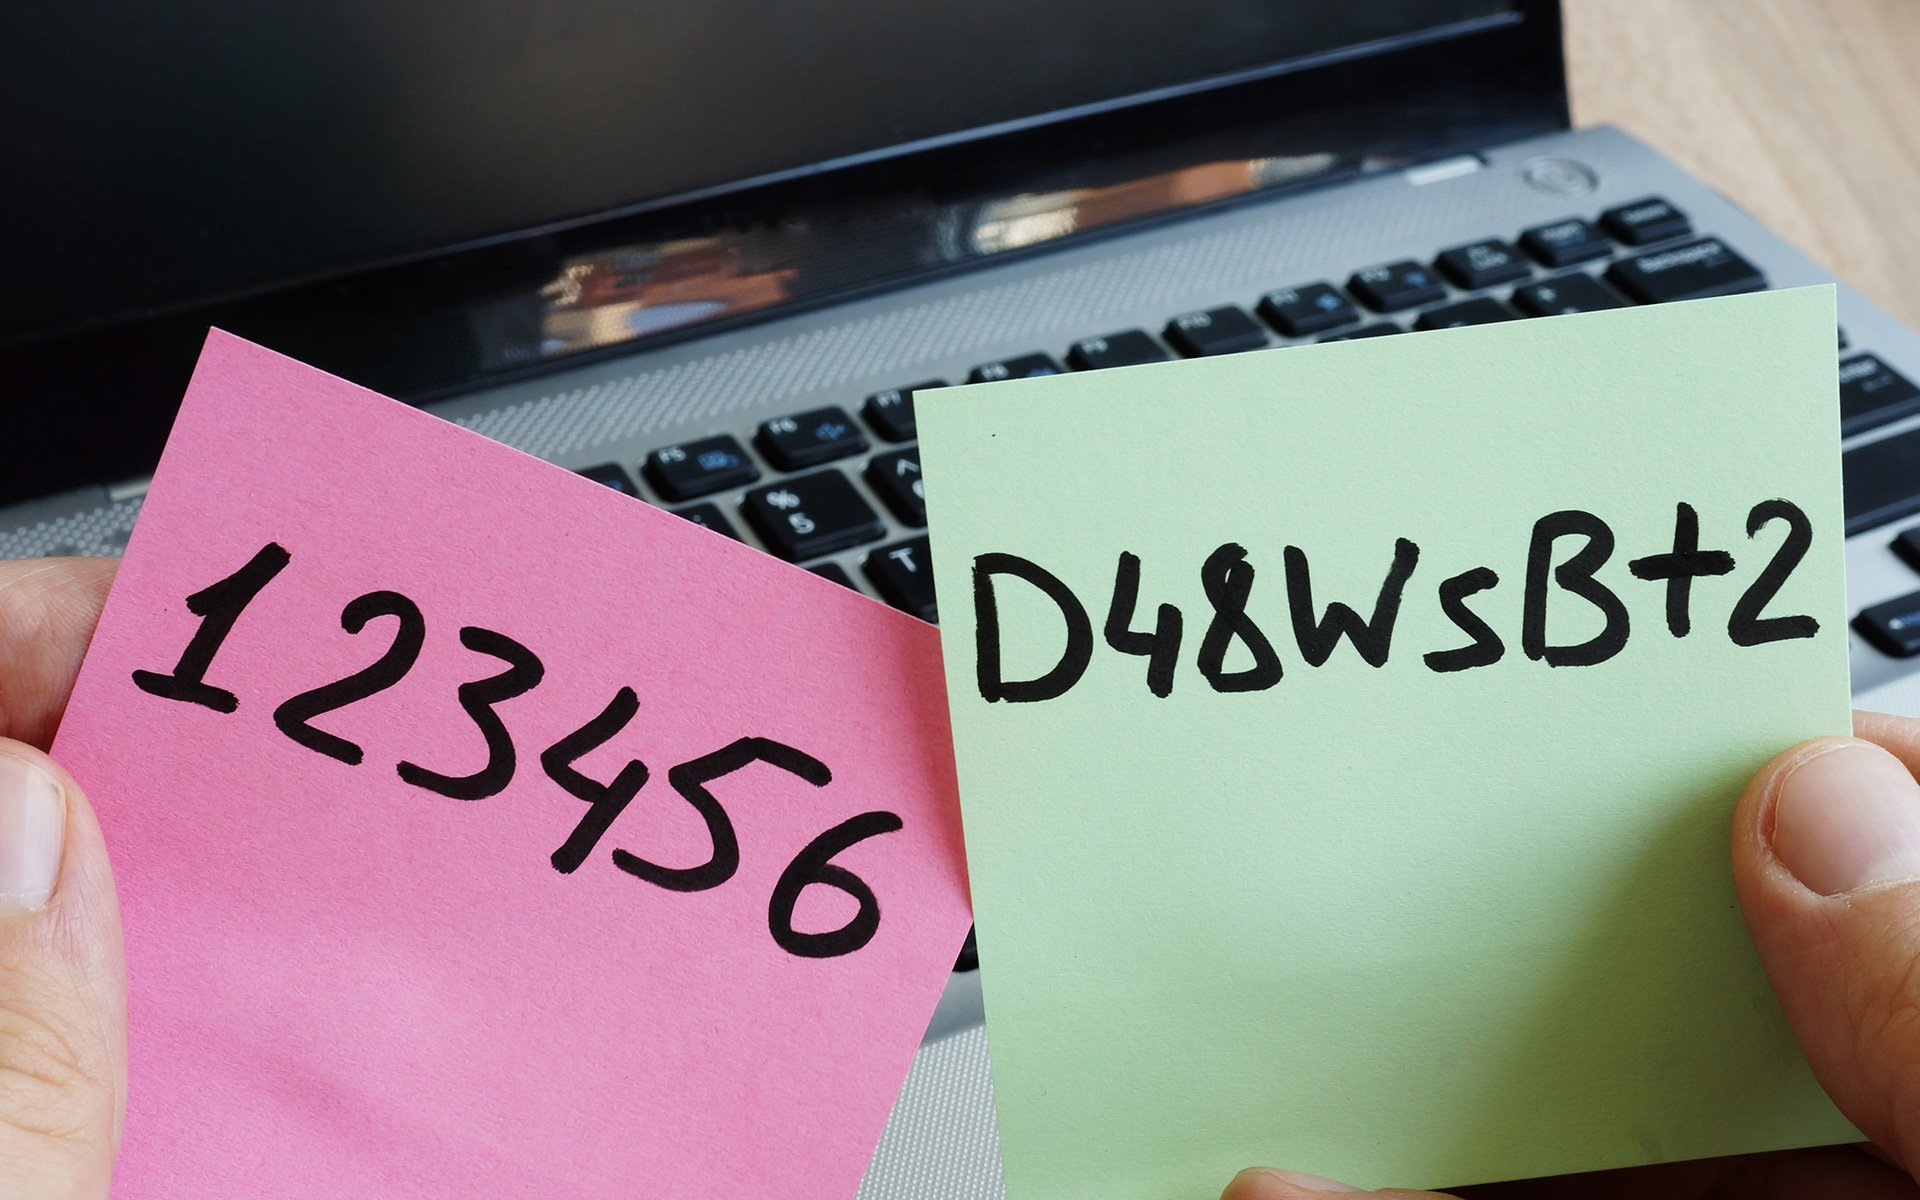 Passwort Manager - Microsoft Windows 10